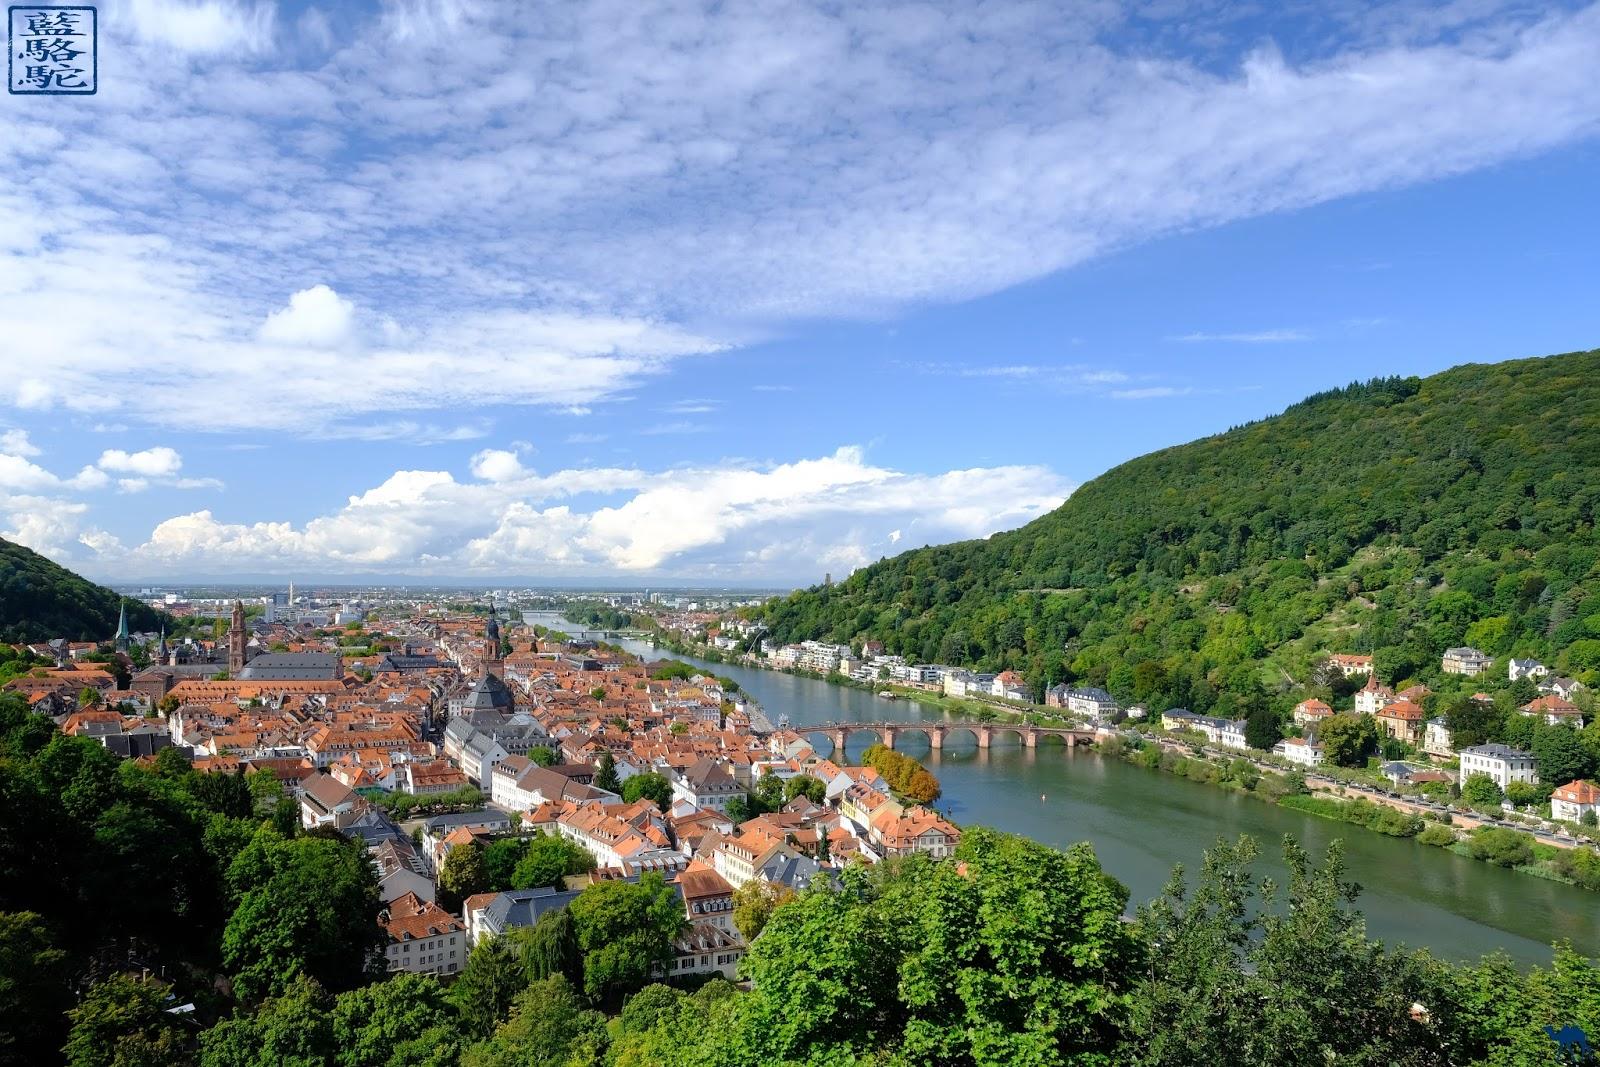 Le Chameau Bleu - Heidelberg - Germany